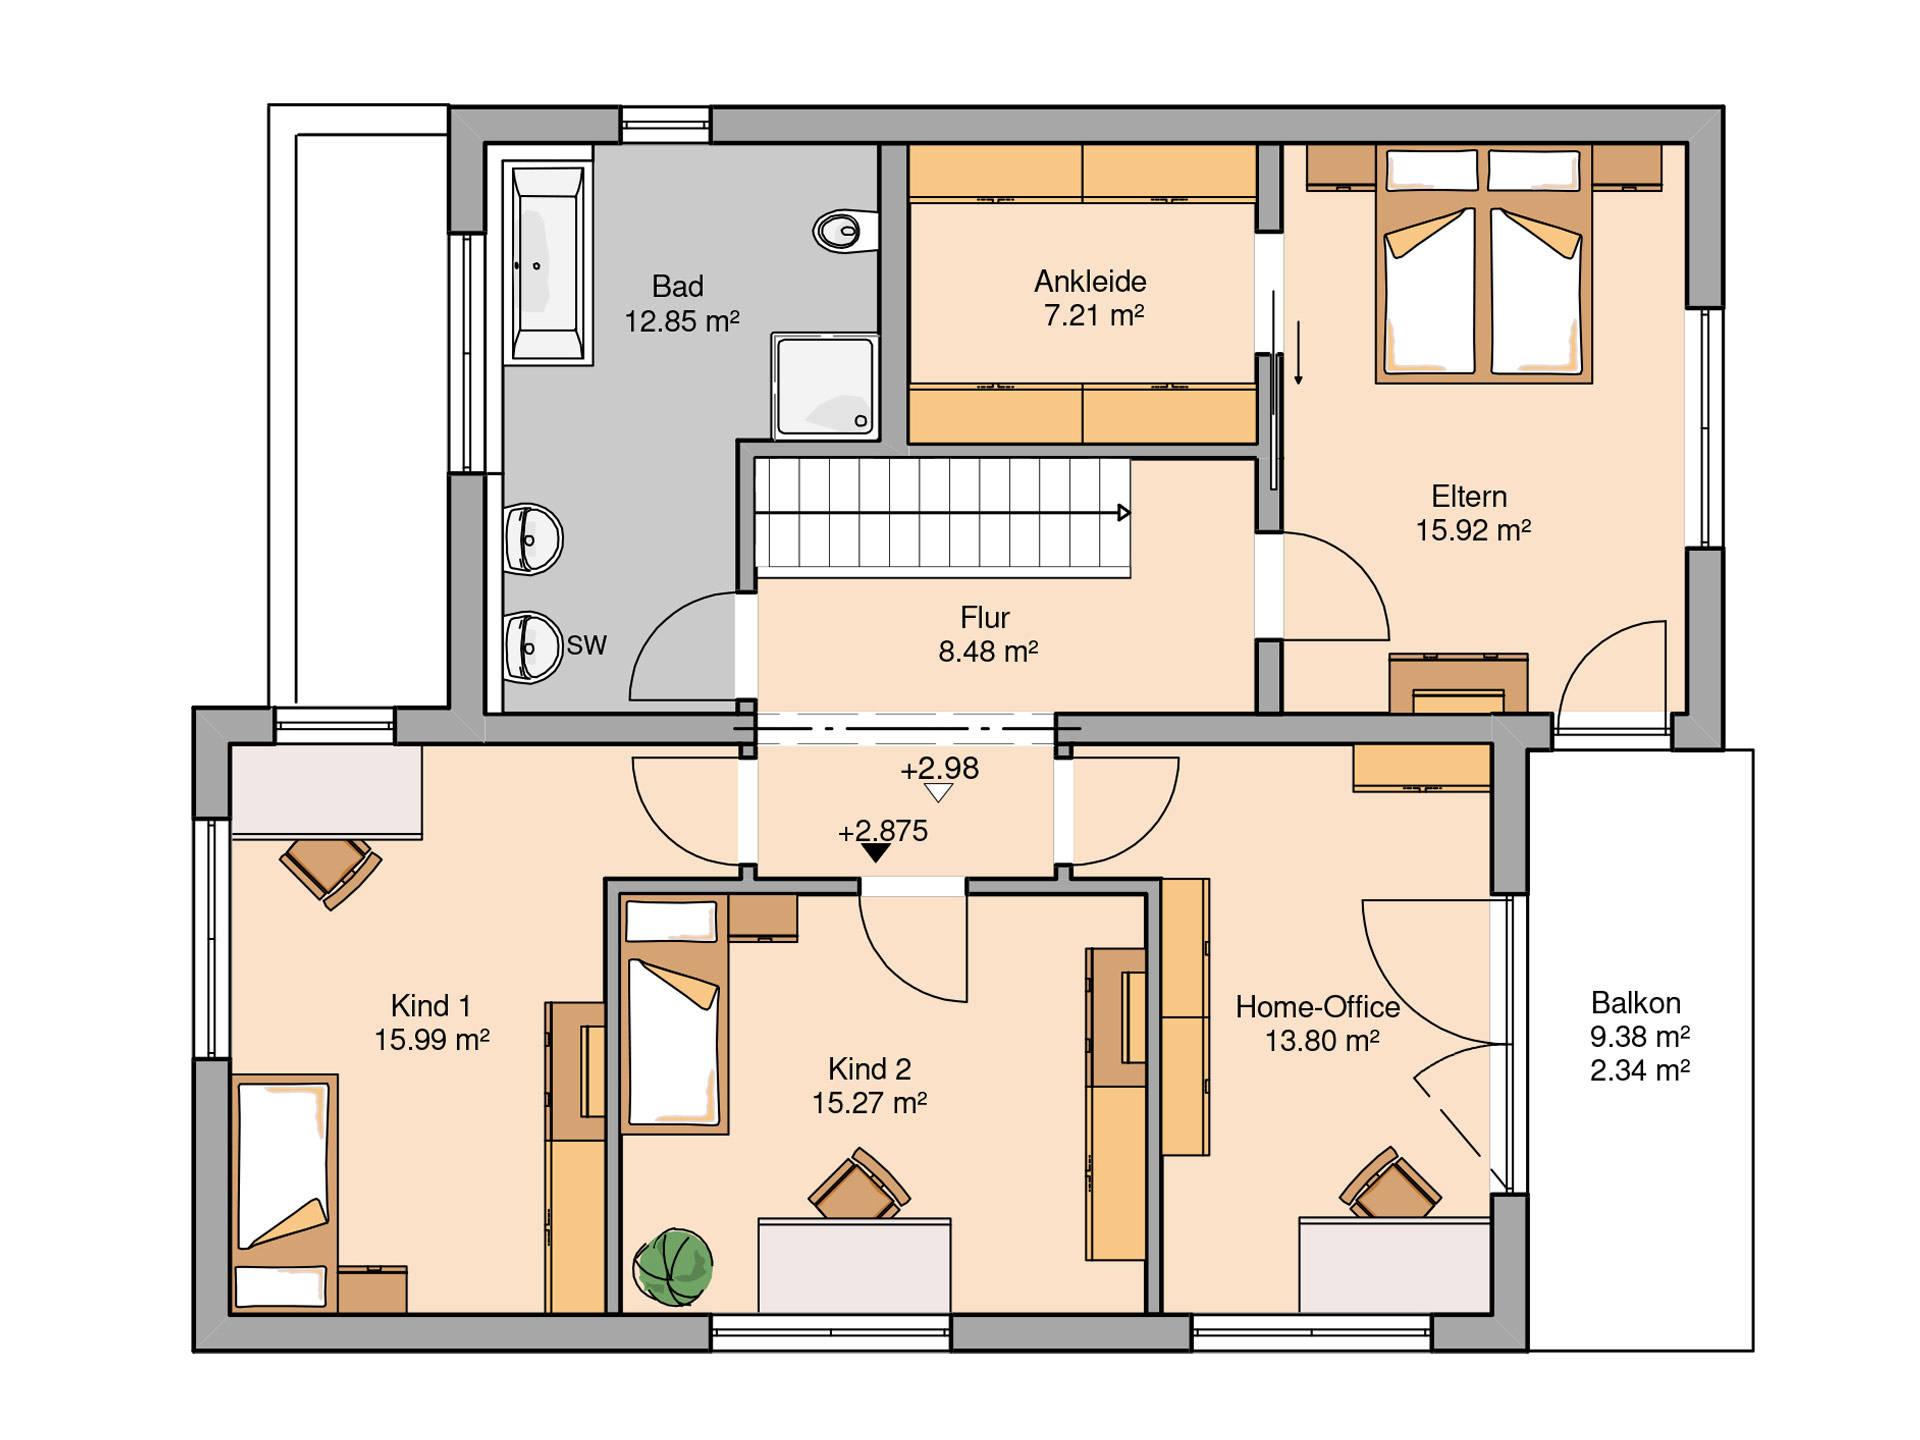 Bauhaus futura kern haus for Bauhaus einfamilienhaus grundriss